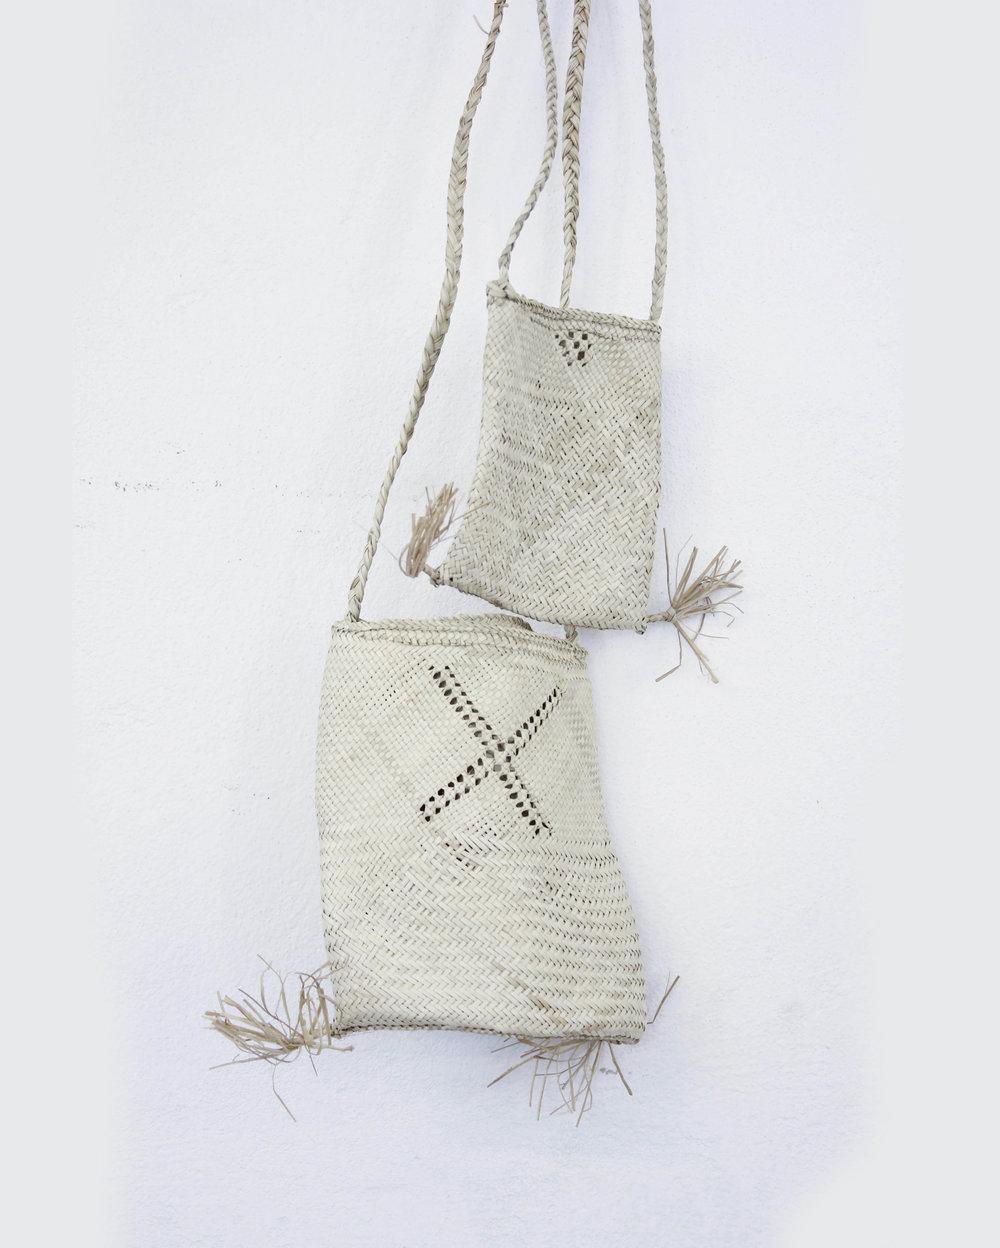 Pentecost Hanging Bags